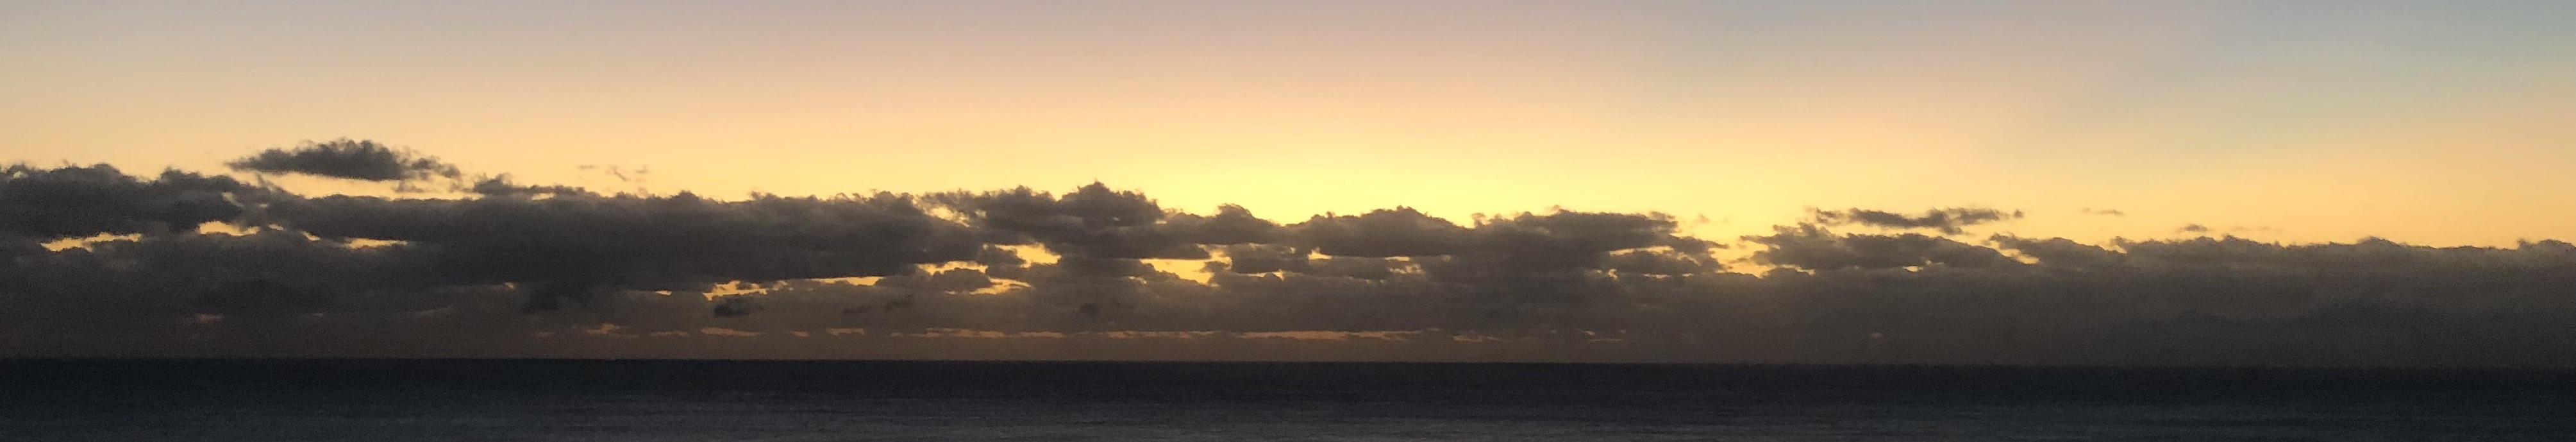 Sunrise, December 6, 2018, at 6:29 AMM